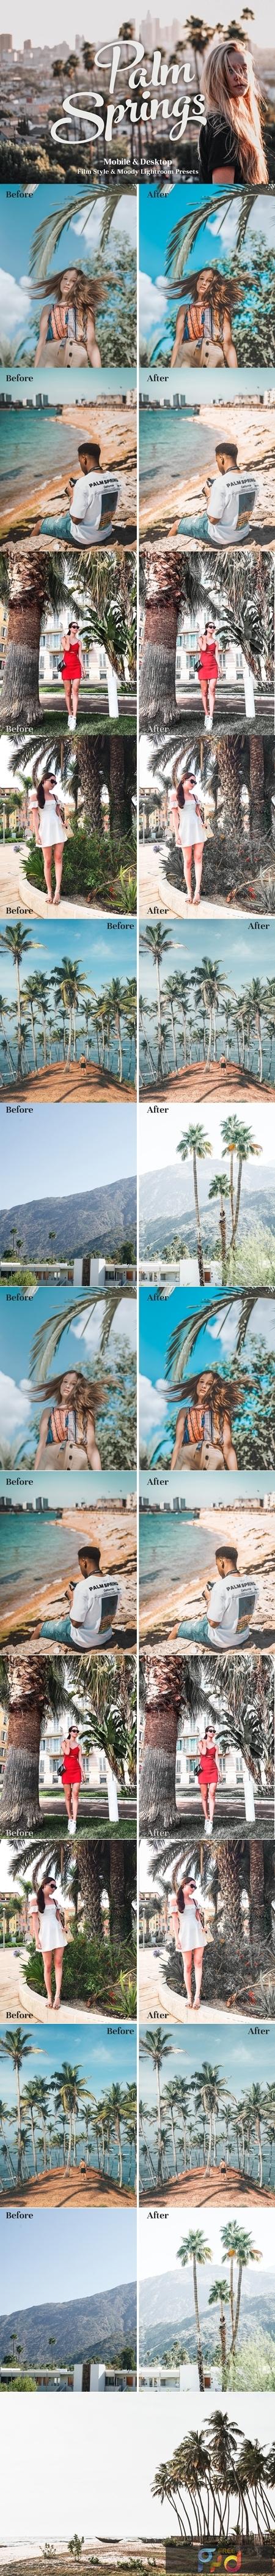 Palm Springs - Lightroom Presets 4387629 1